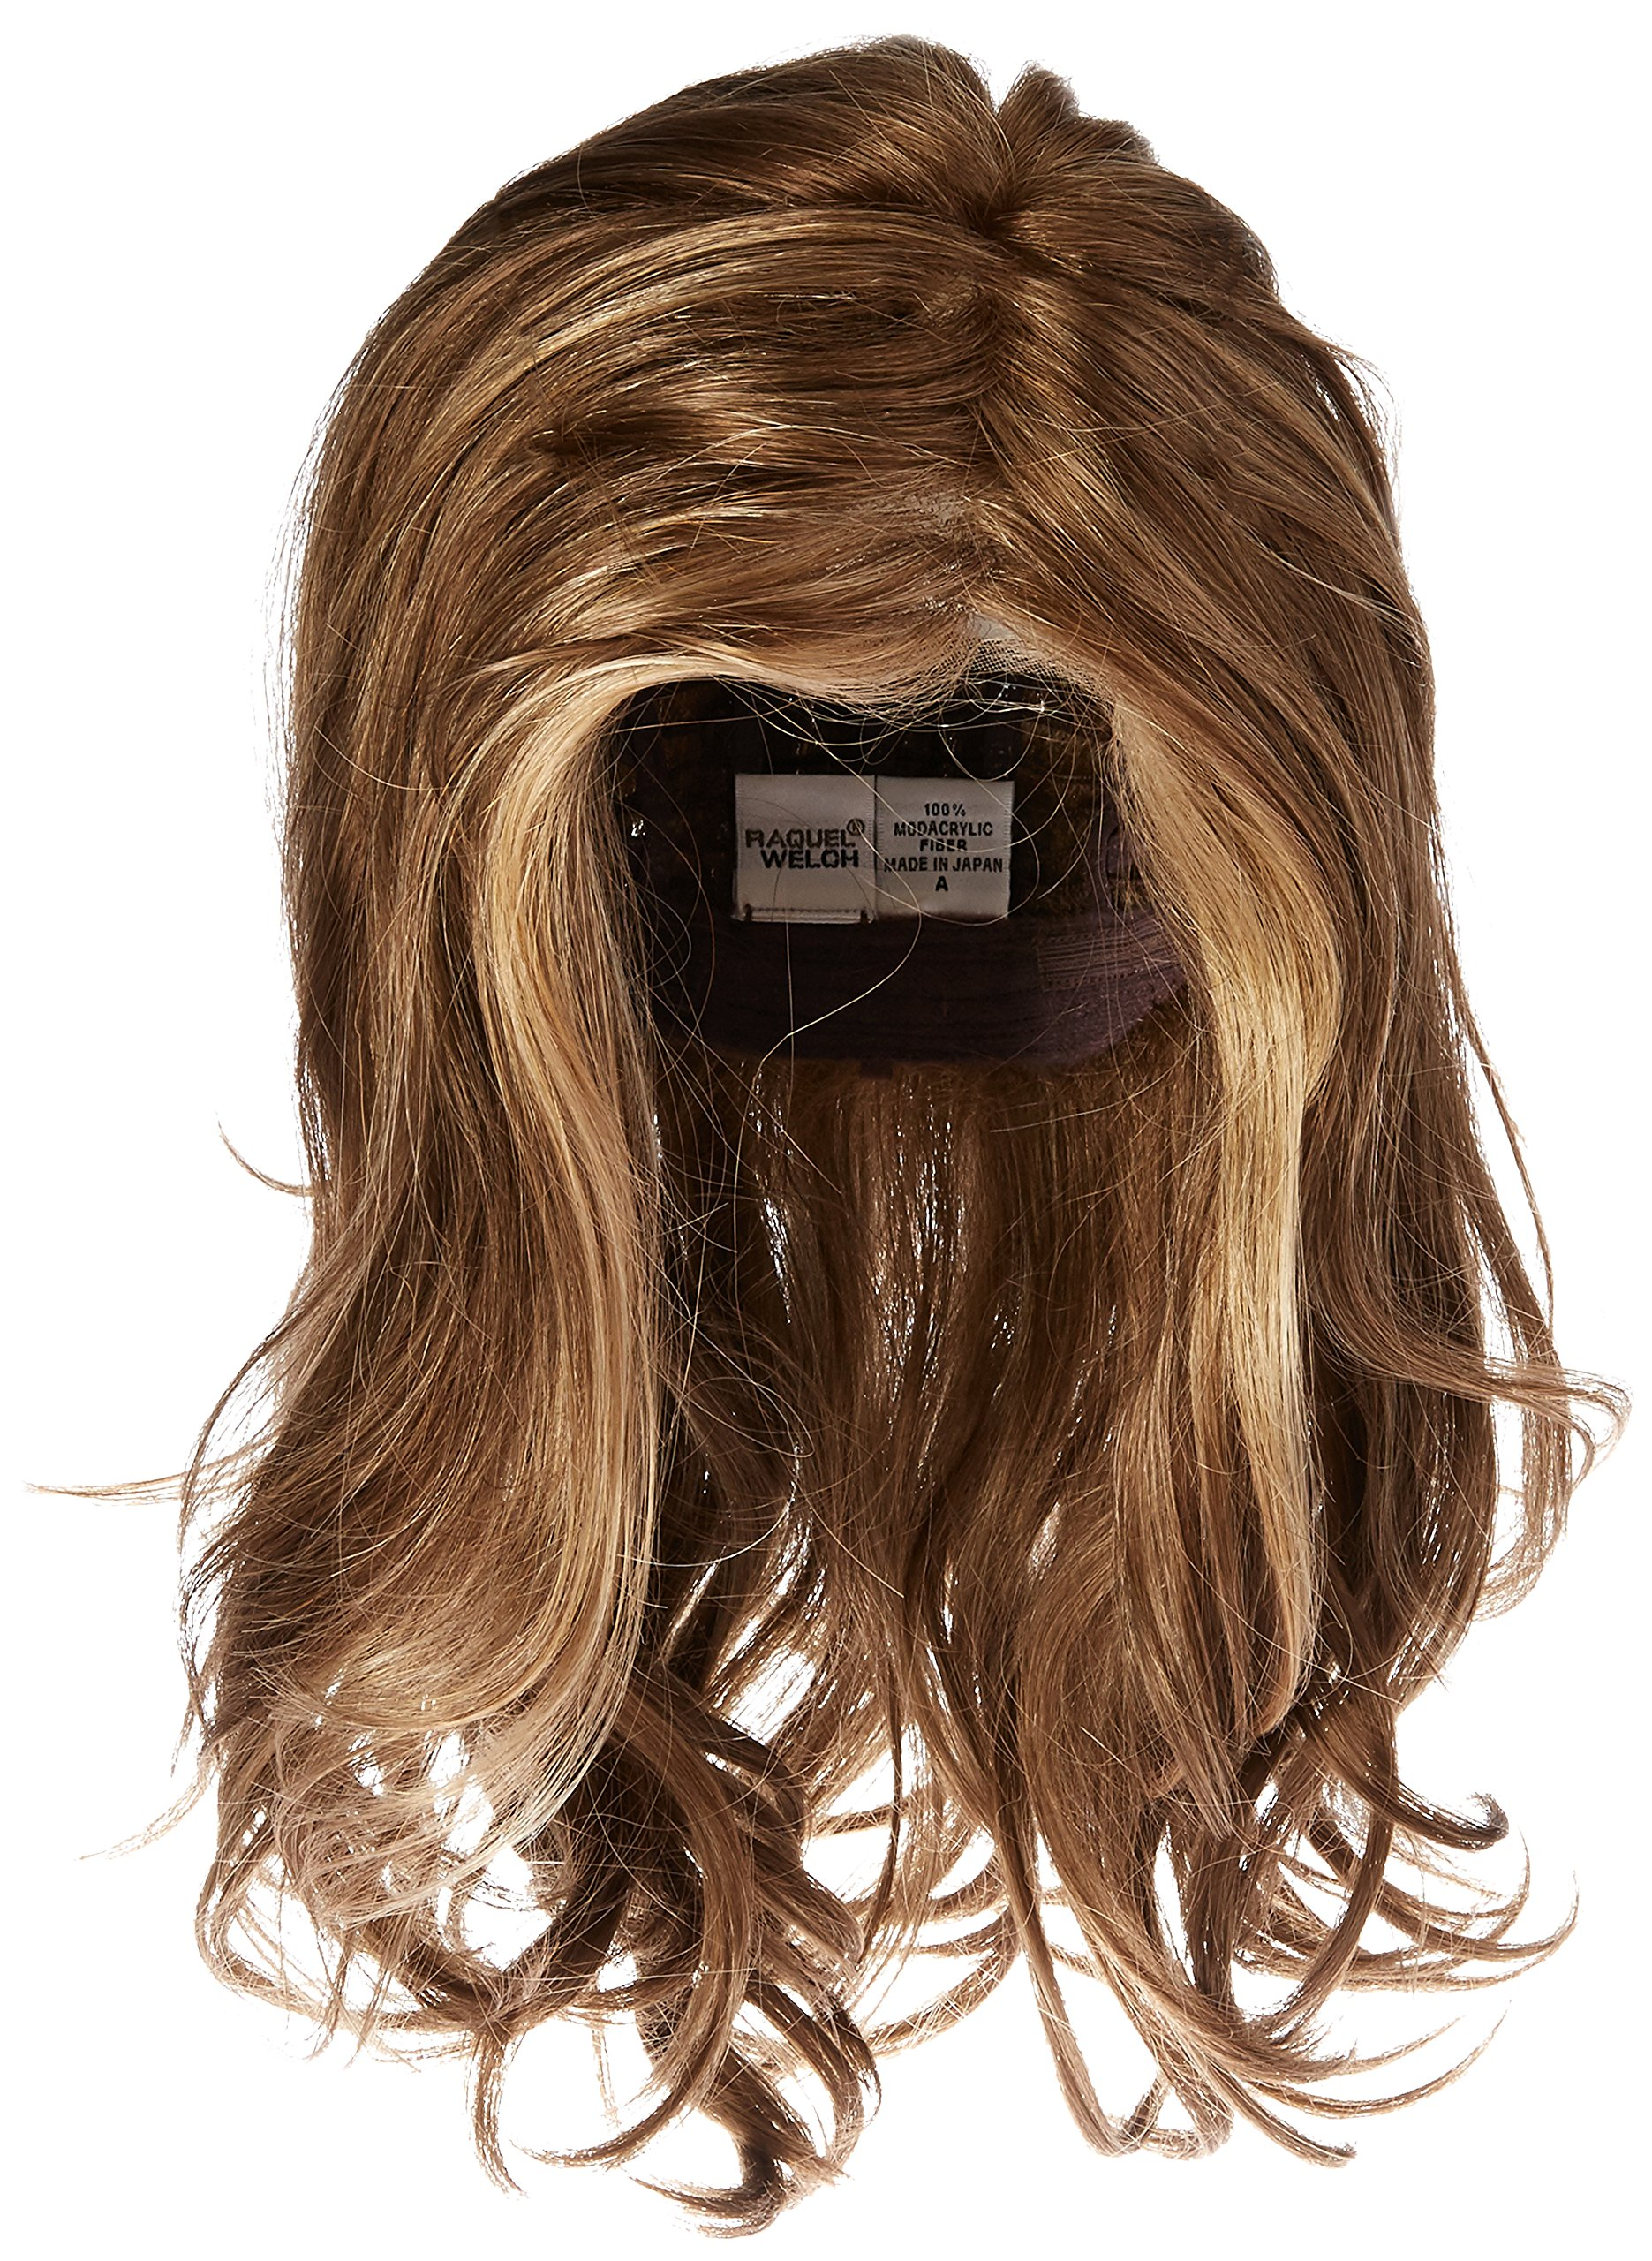 Hairdo Love Love Love Long Full Length Straight Hair With Soft Natural Wave Highlights, R12/26H Honey Pecan by Hairuwear by Hair u wear